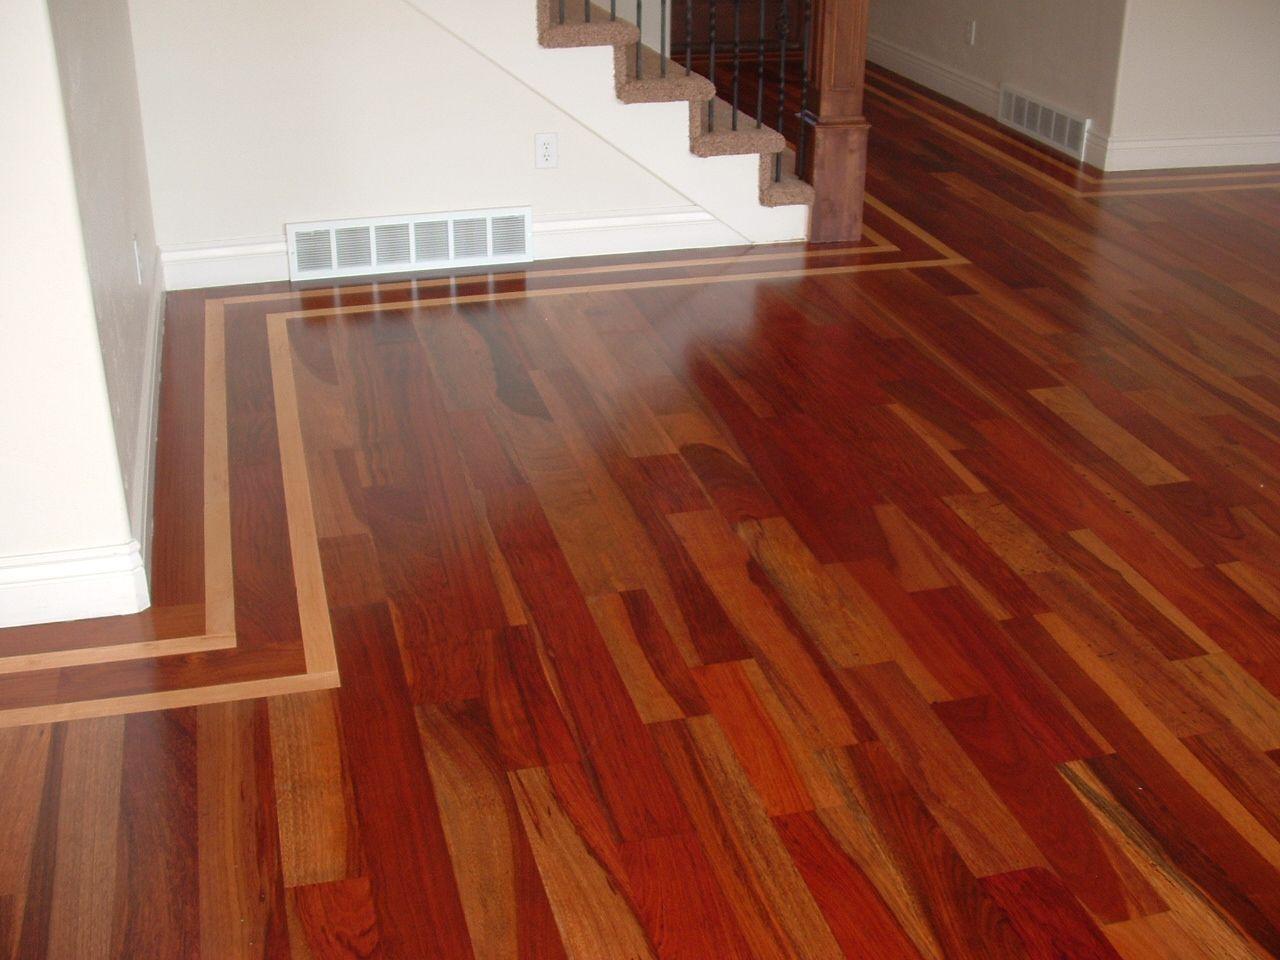 Brazilian Cherry Hardwood Flooring - Flooring Ideas Home ...